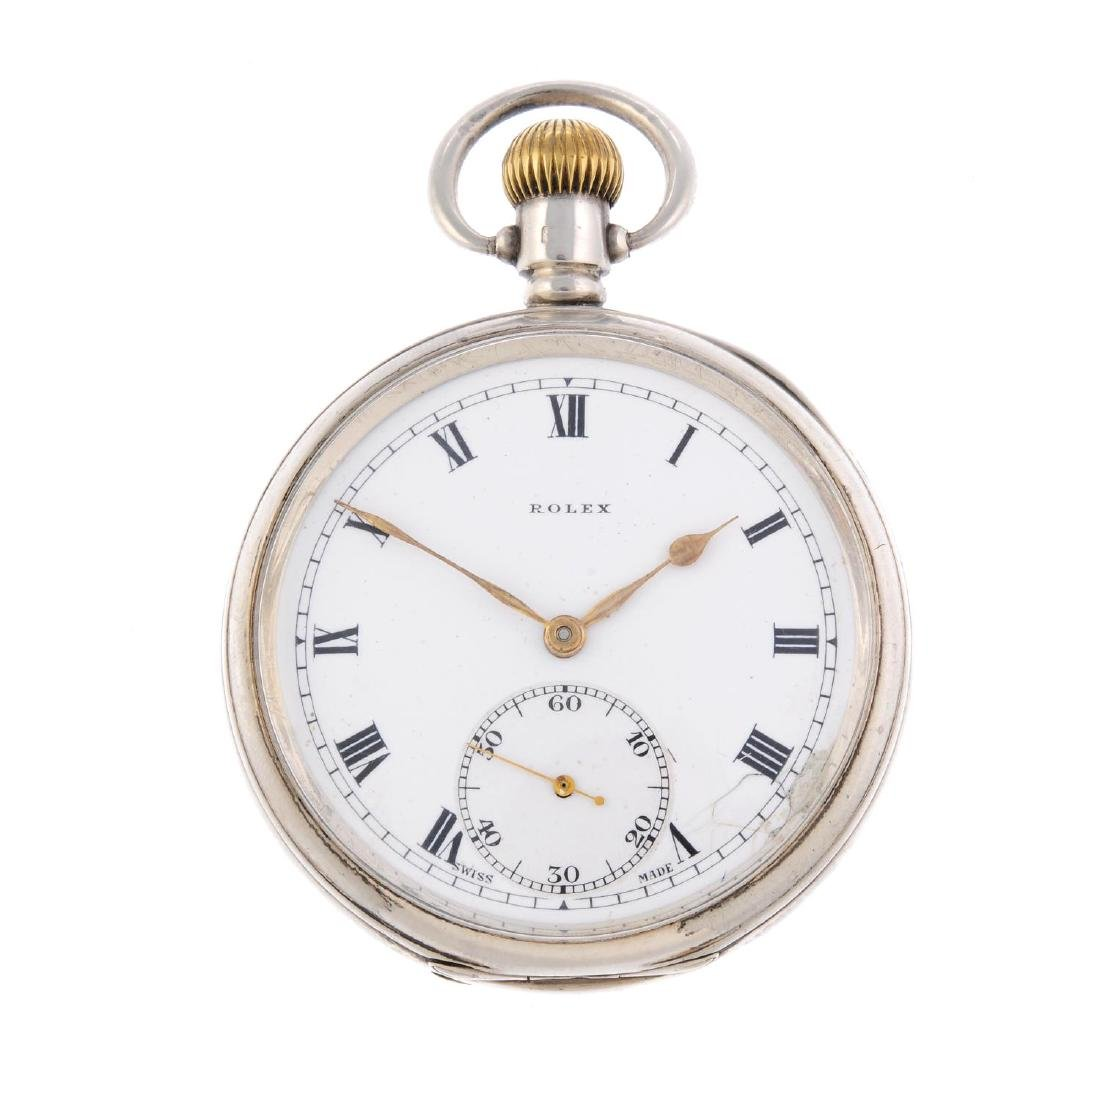 An open face pocket watch by Rolex. Silver case,